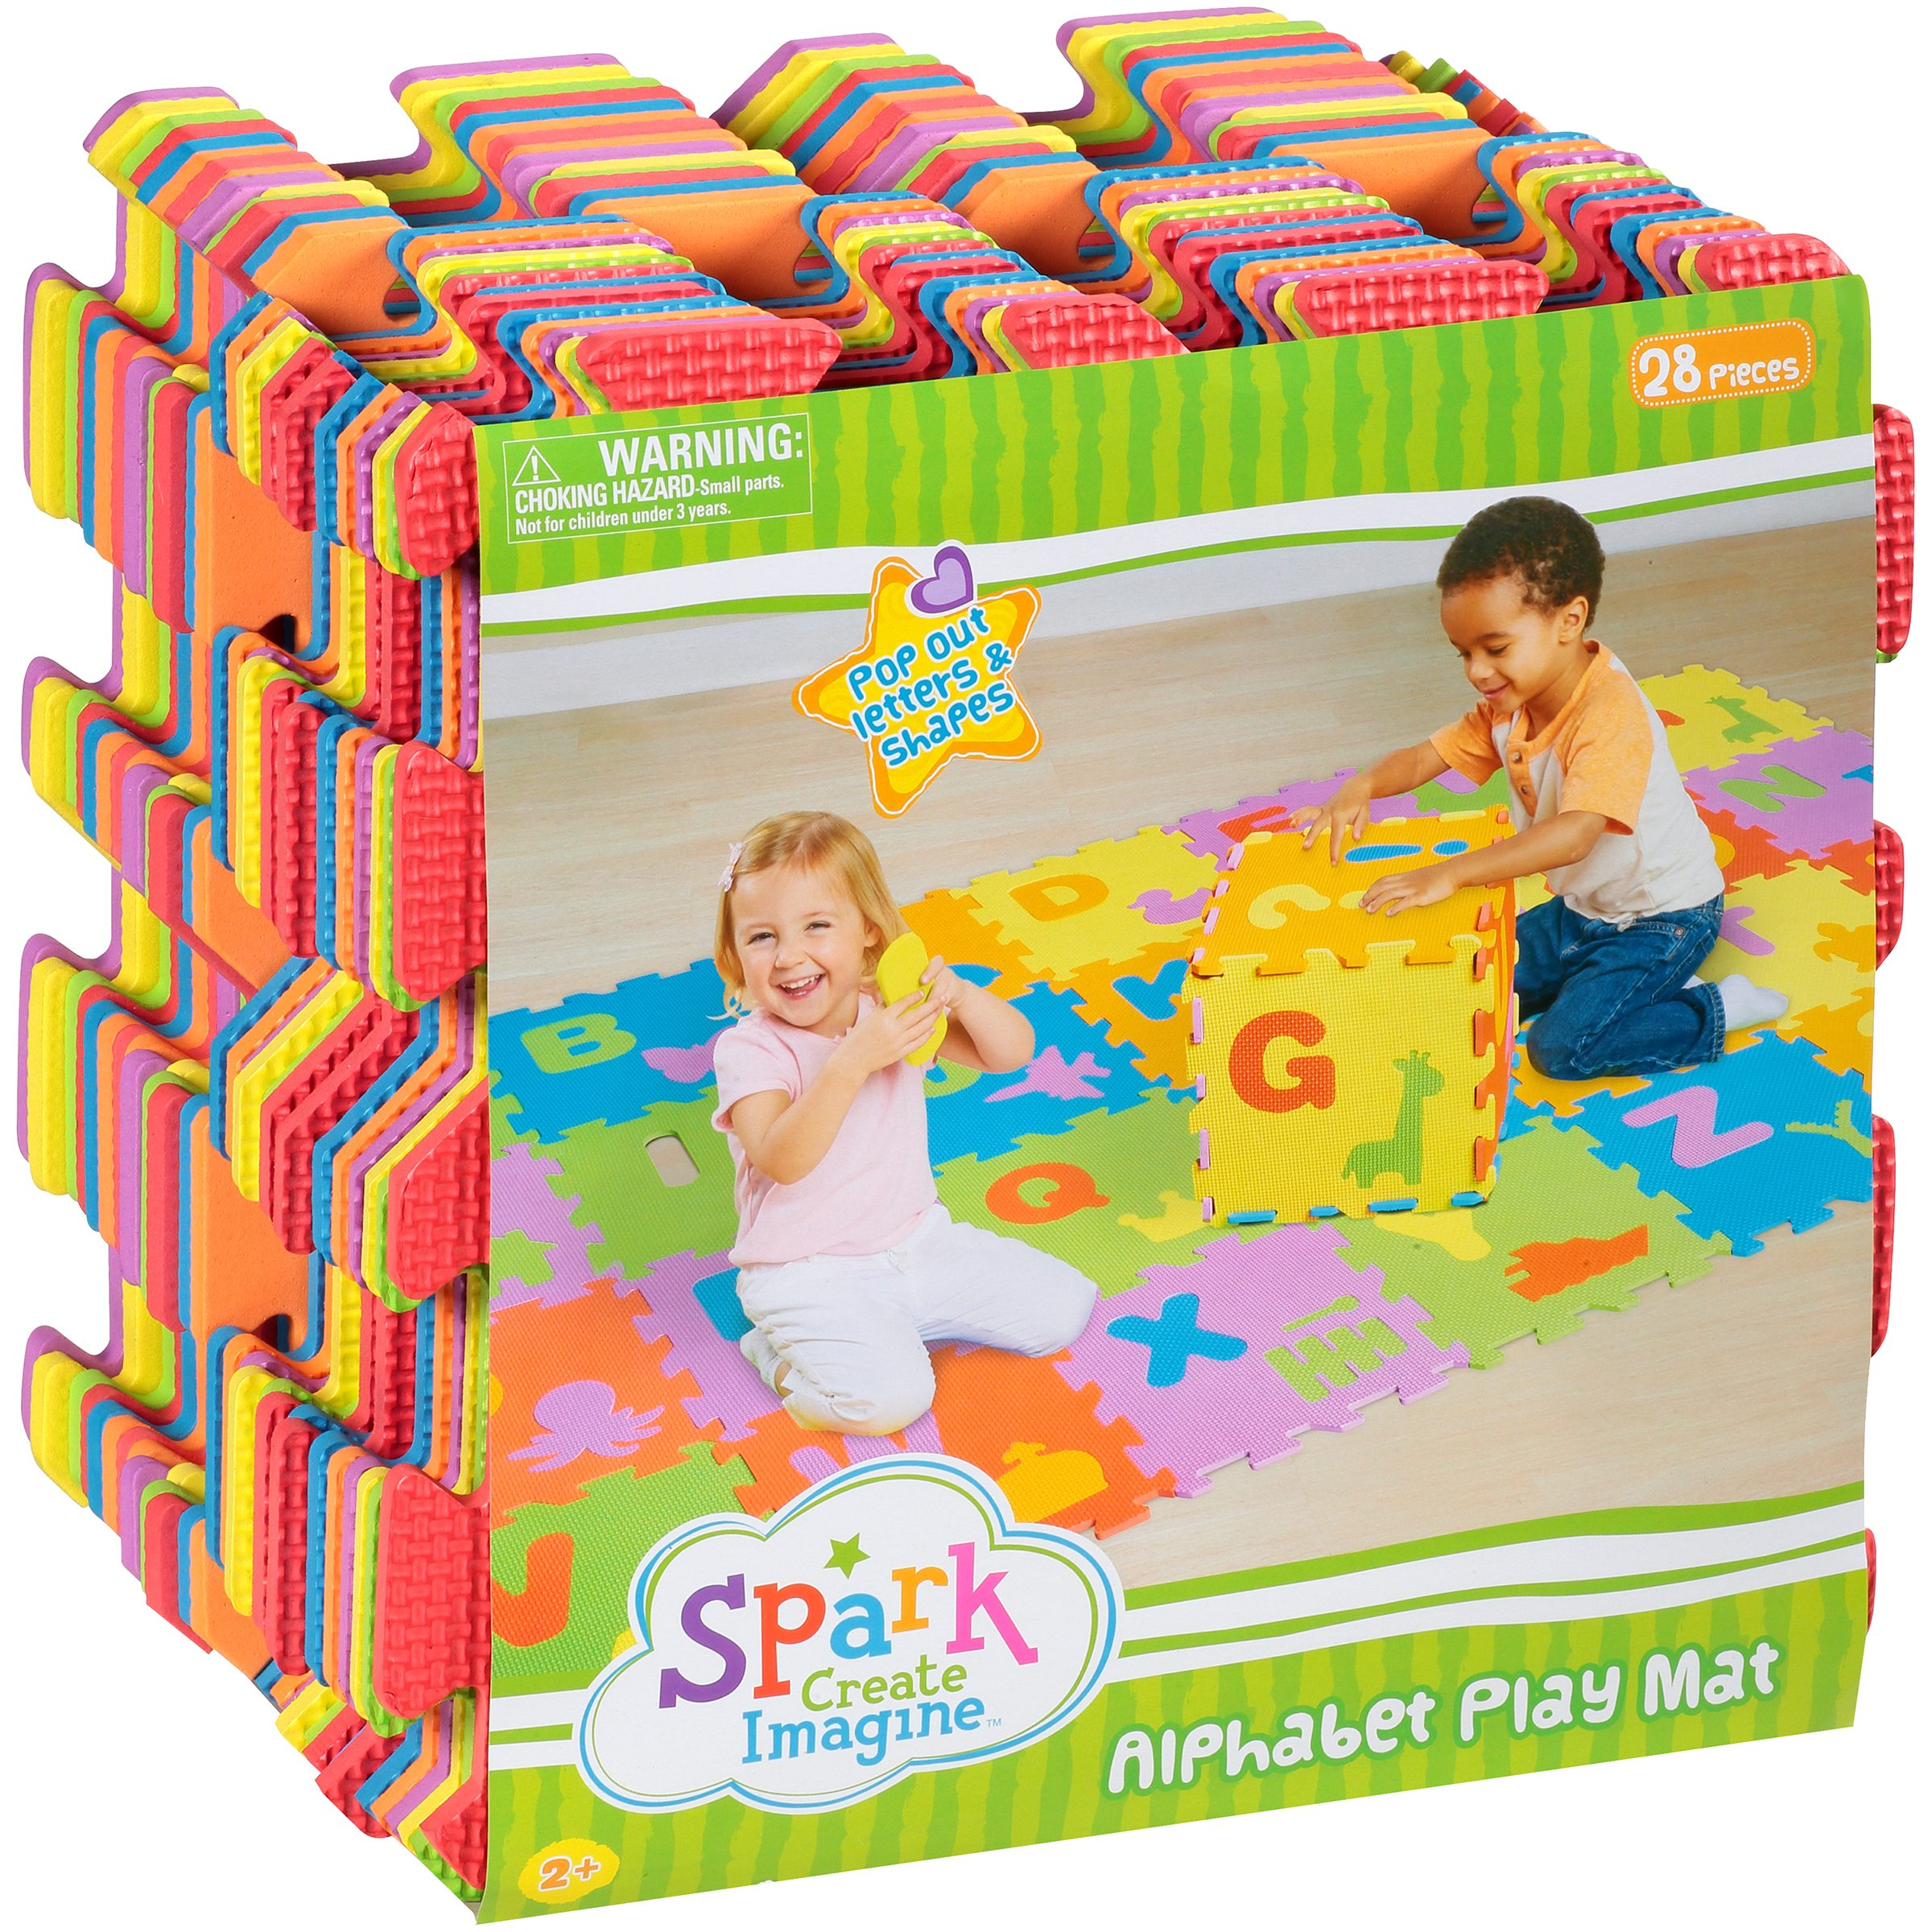 Spark Create Imagine Alphabet Play Mat, 2+ Years, 28 Pieces